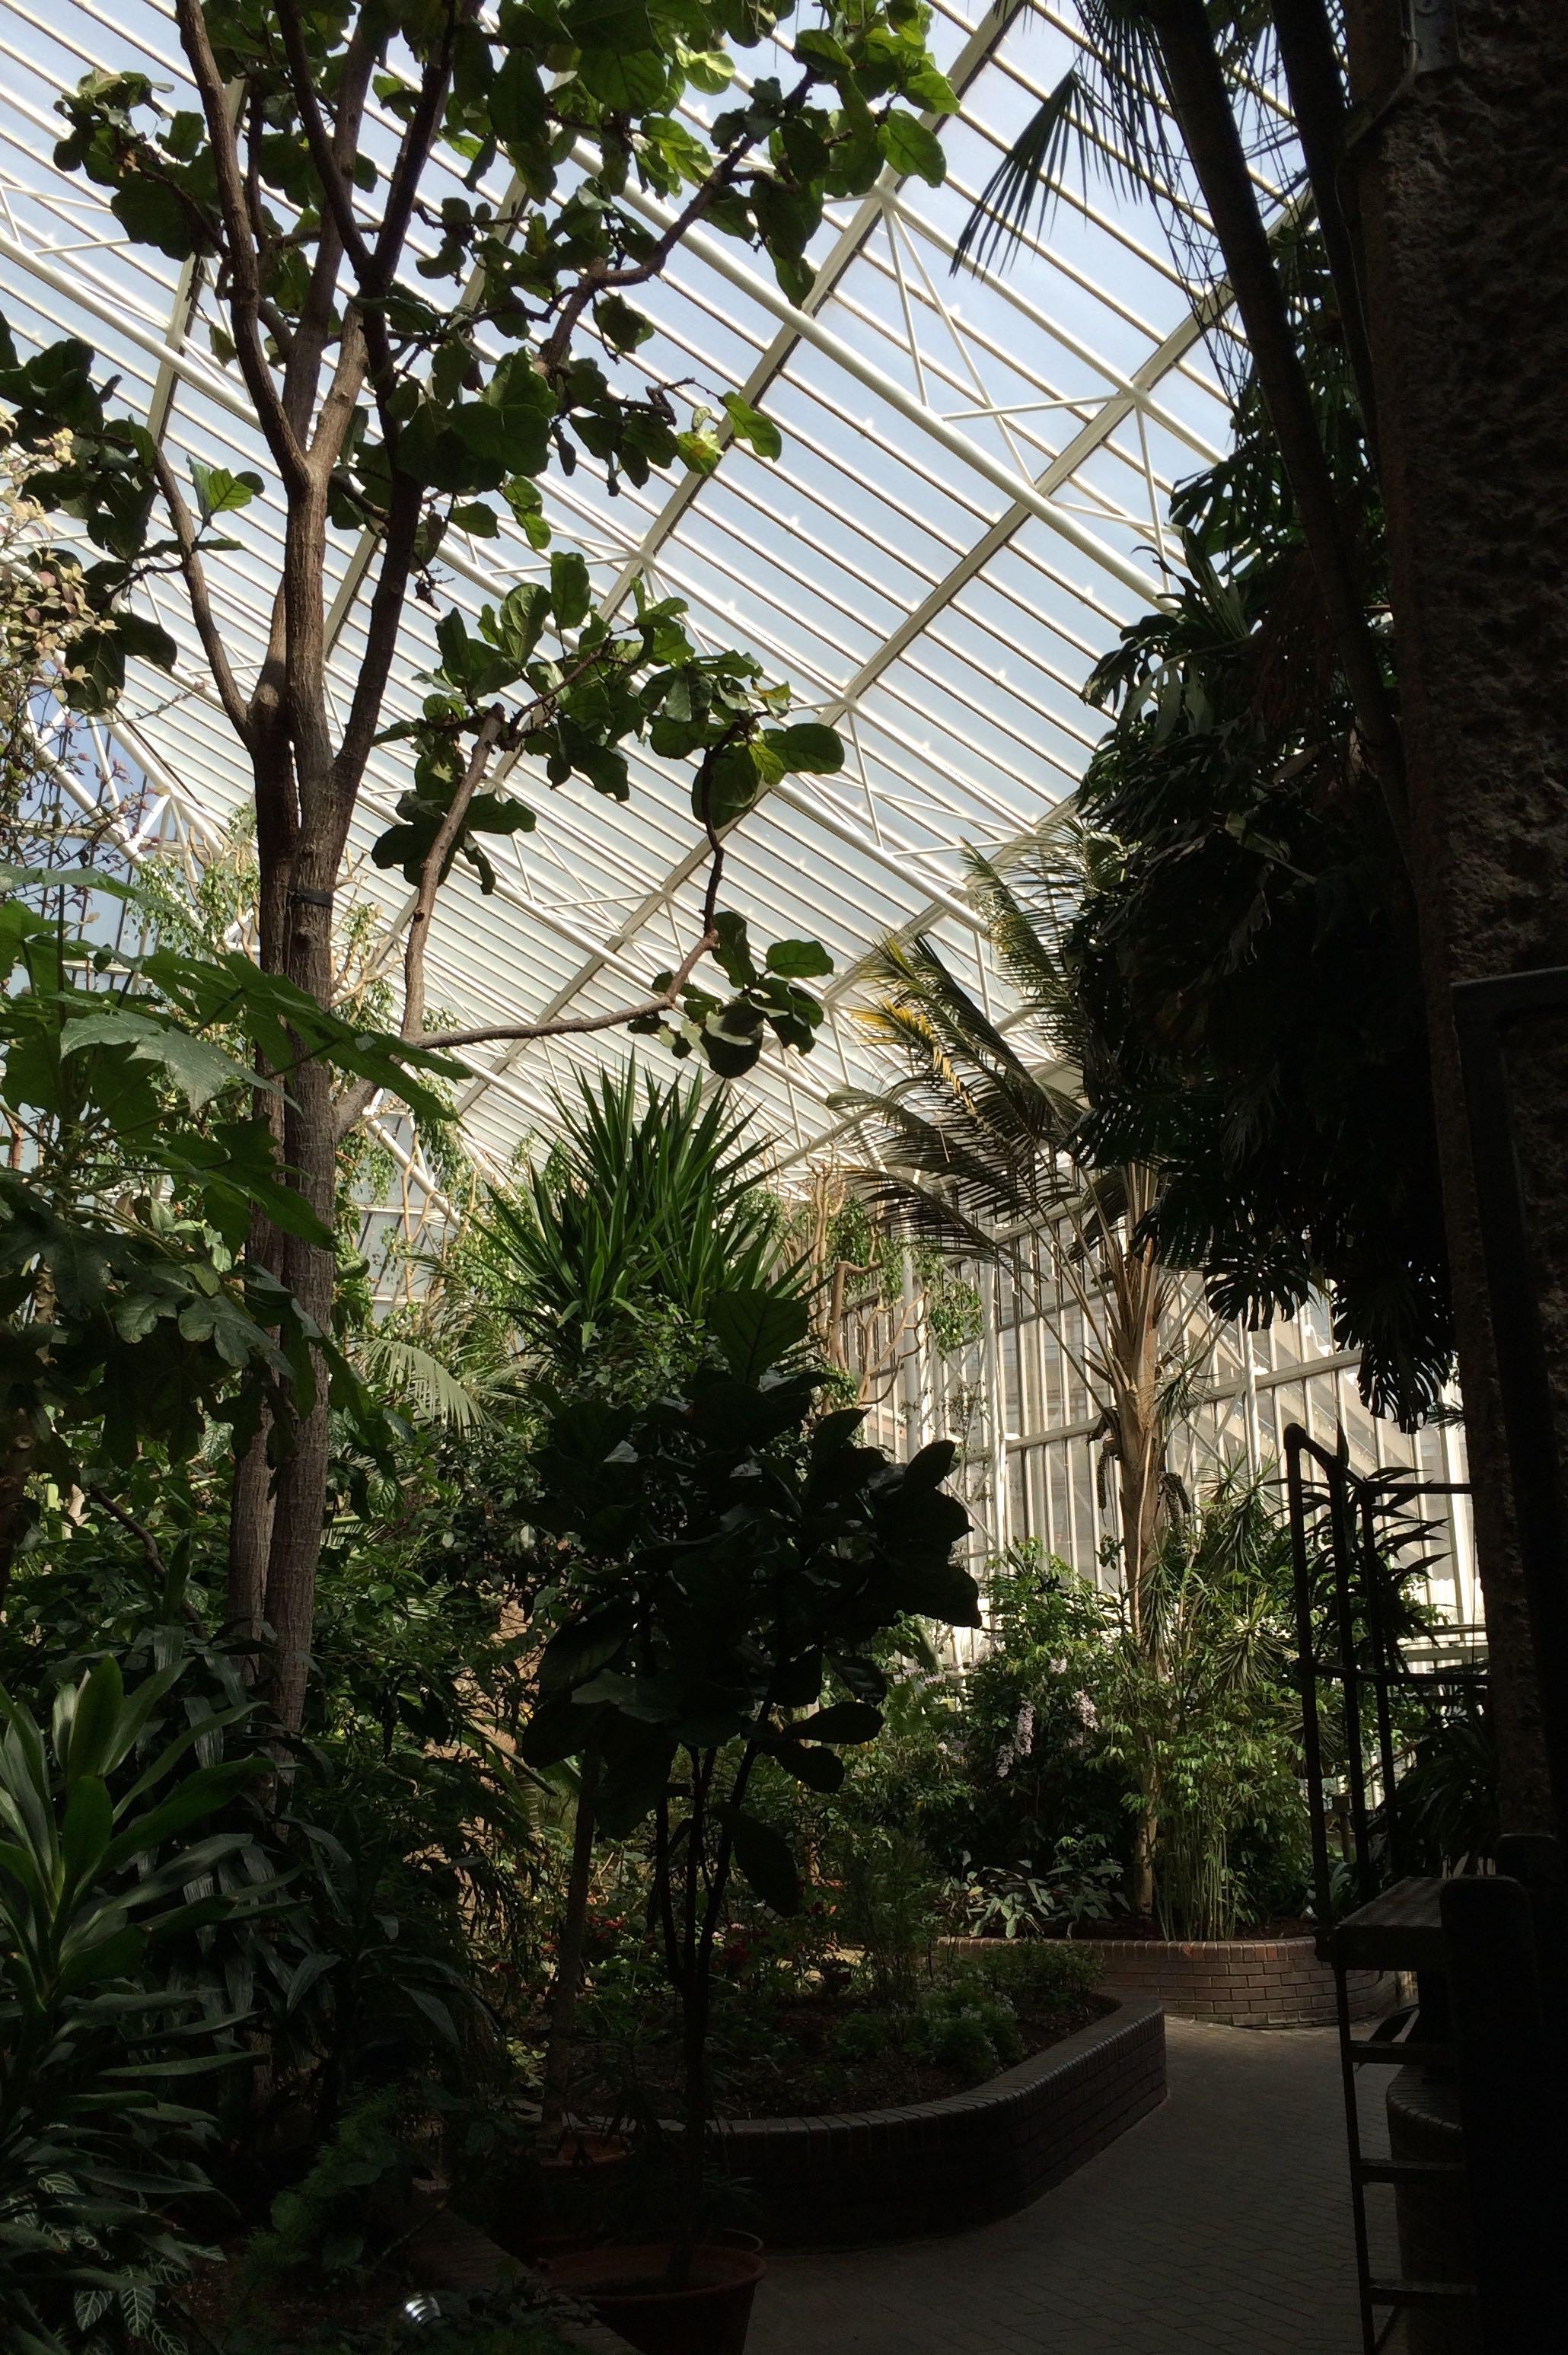 London photos scifi greenhouse  FlickFilosophercom